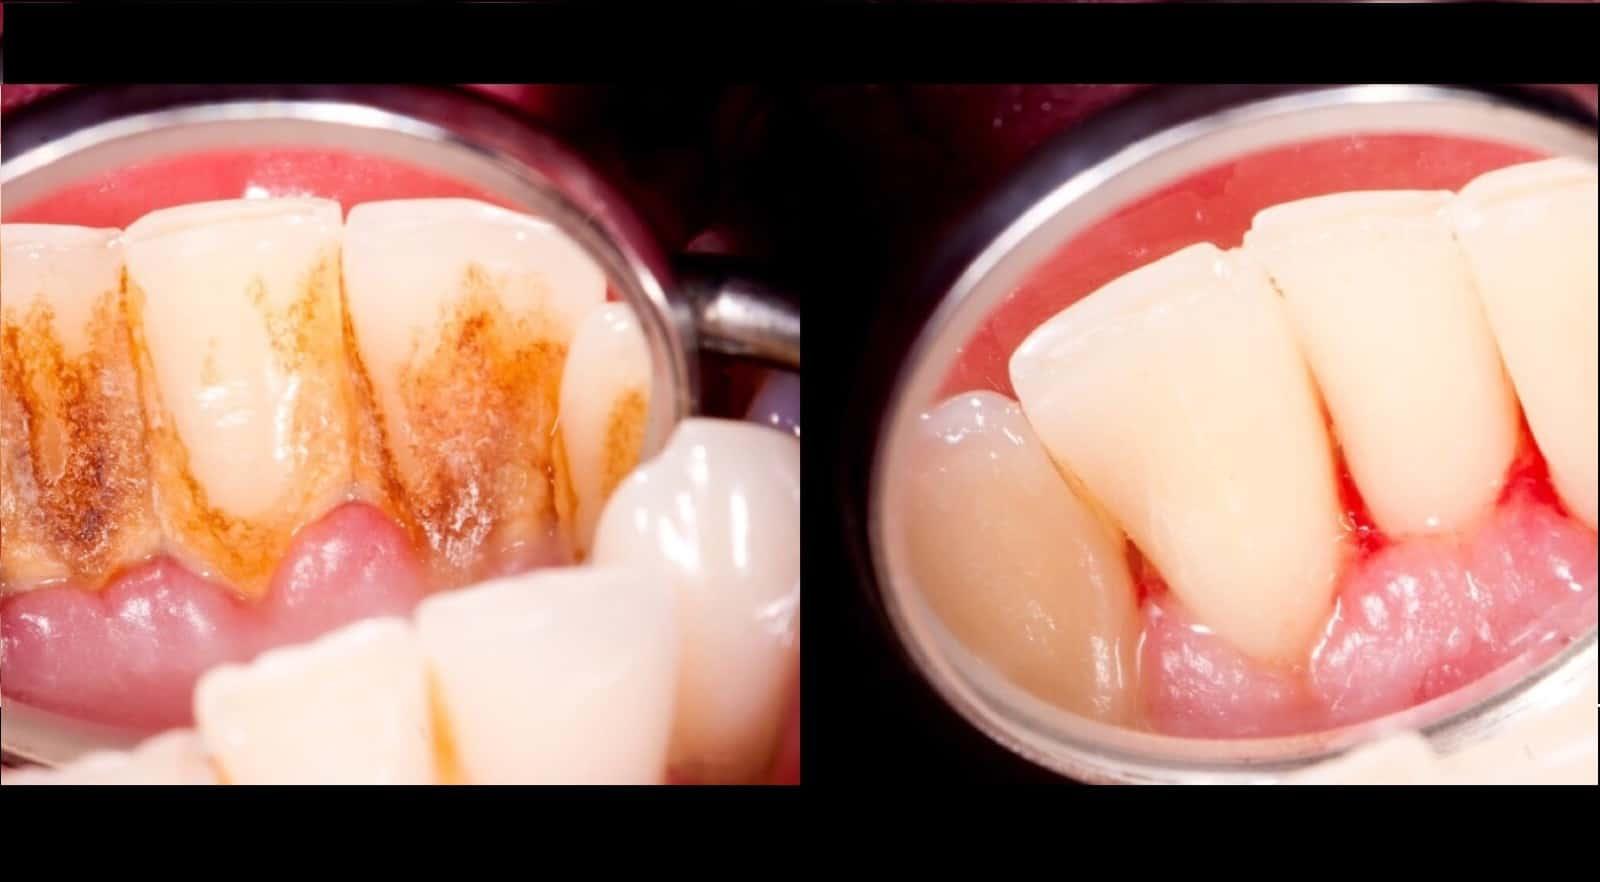 how to avoid plaque buildup on teeth